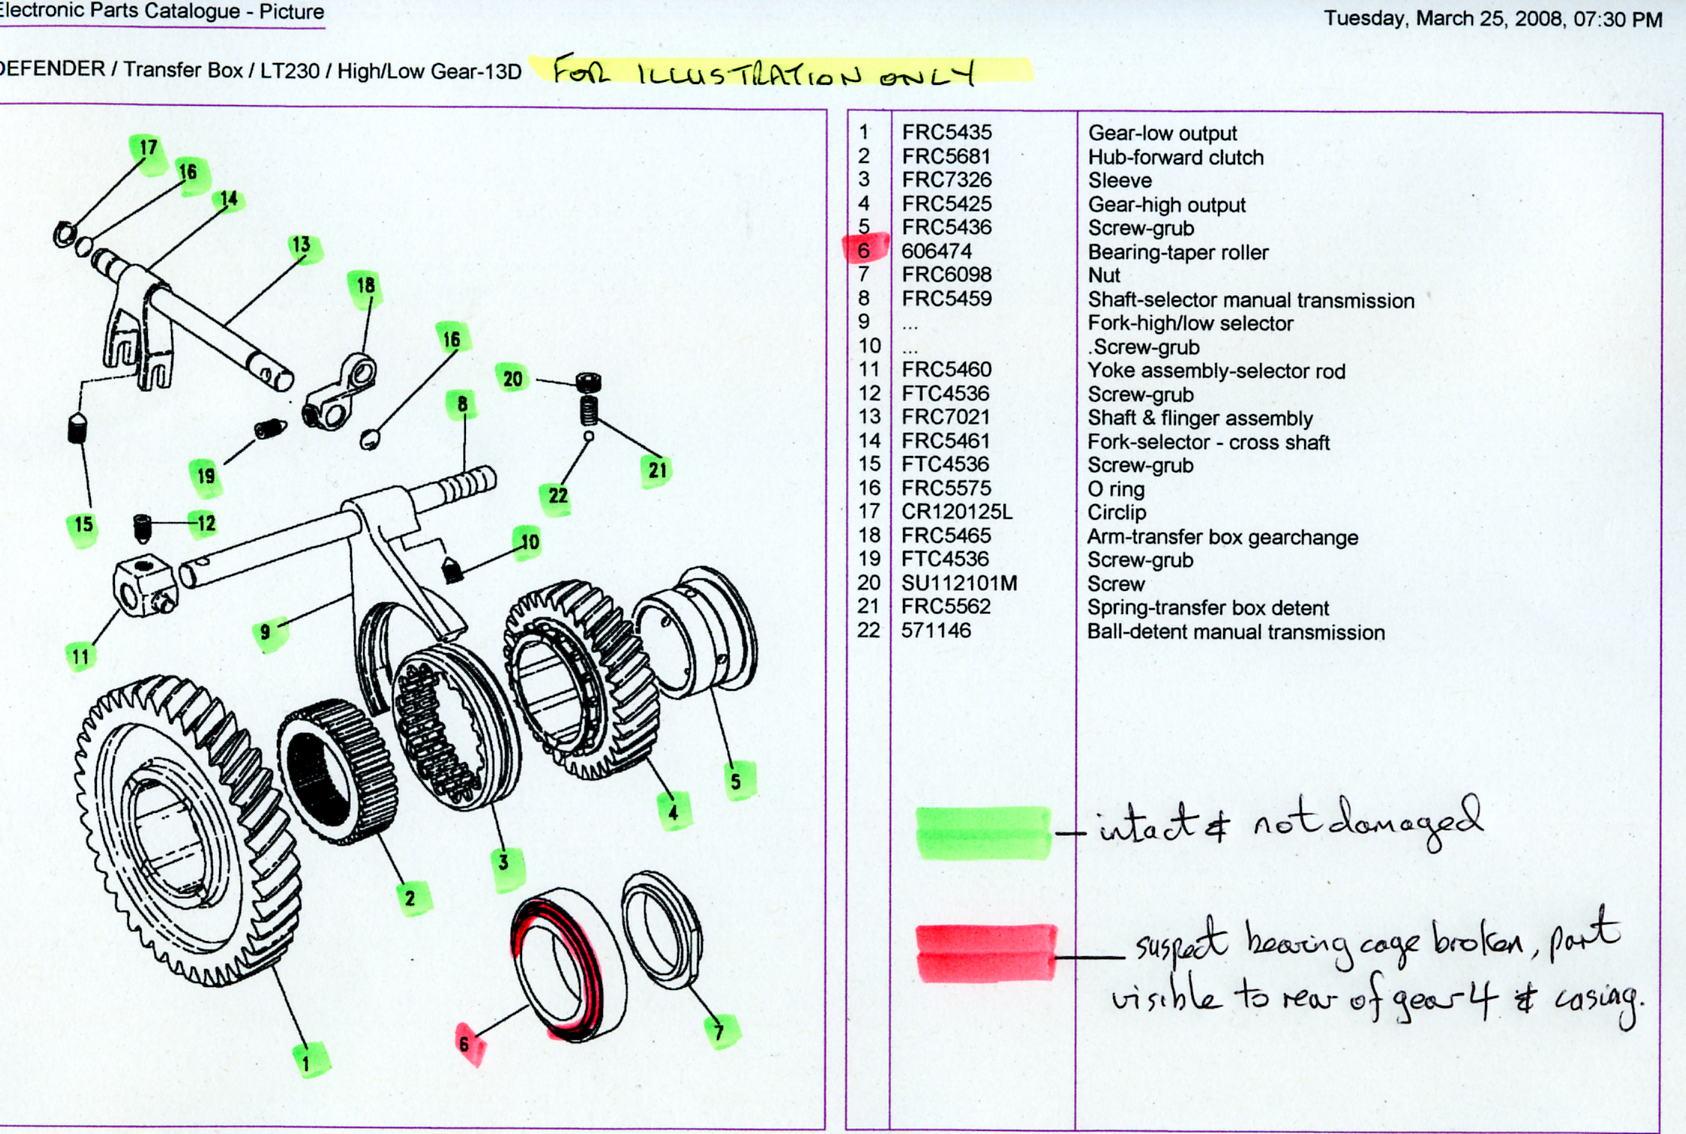 LT230 transferbox - Defender Forum - LR4x4 - The Land Rover